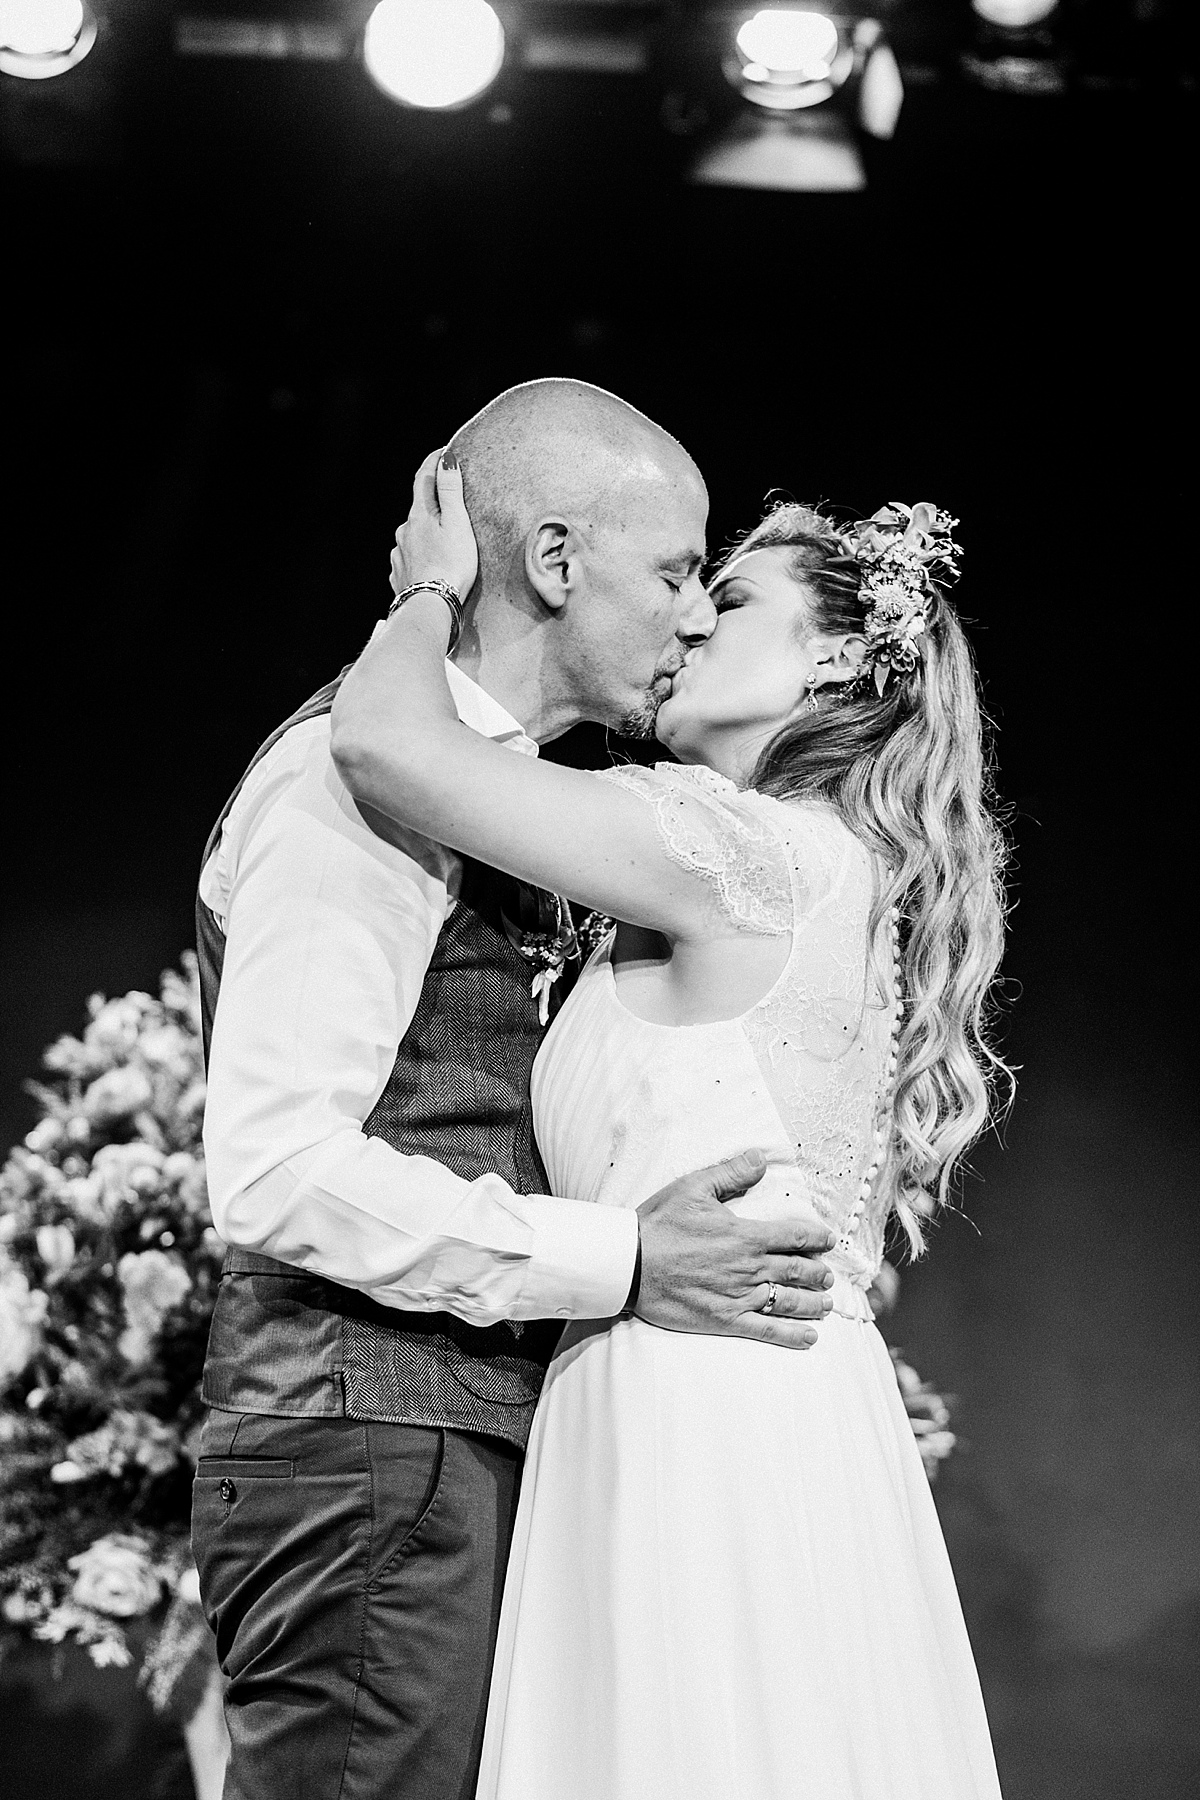 056-albamay-fotografia-artistica-boda-teatro-lara-madrid-1200x800-